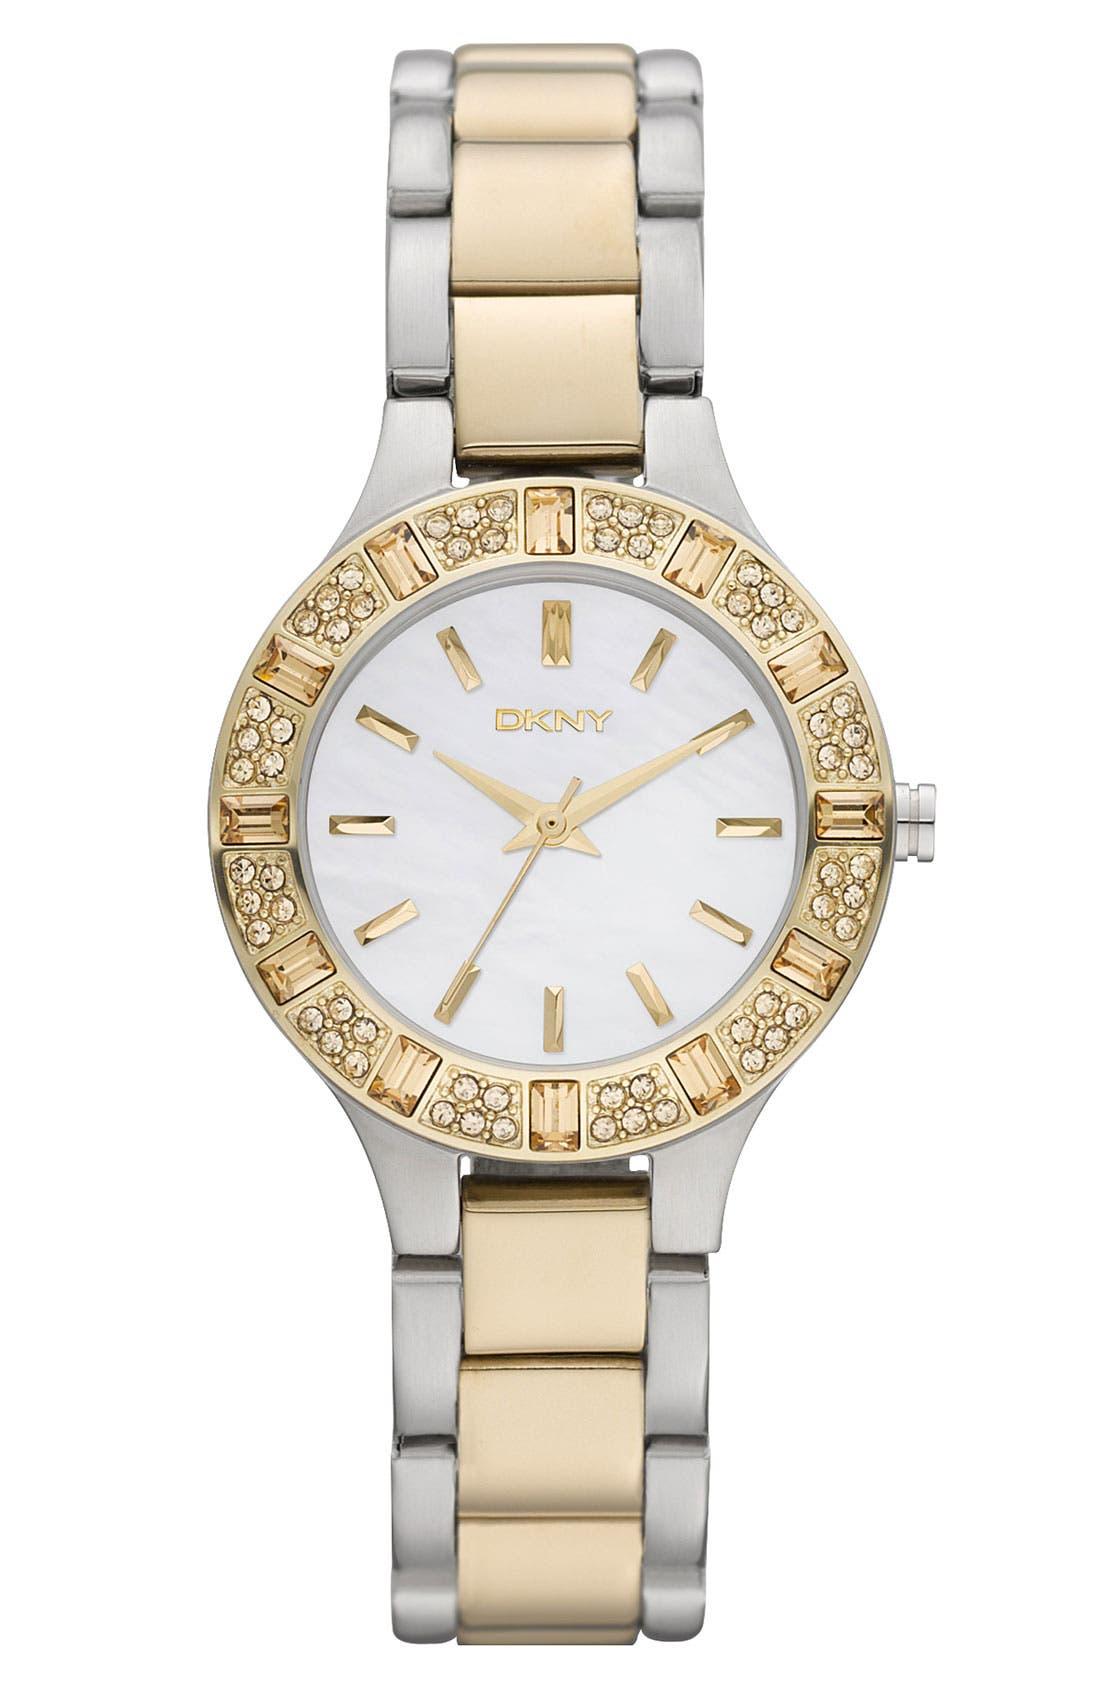 Main Image - DKNY 'Chambers' Crystal Bezel Two Tone Watch, 30mm